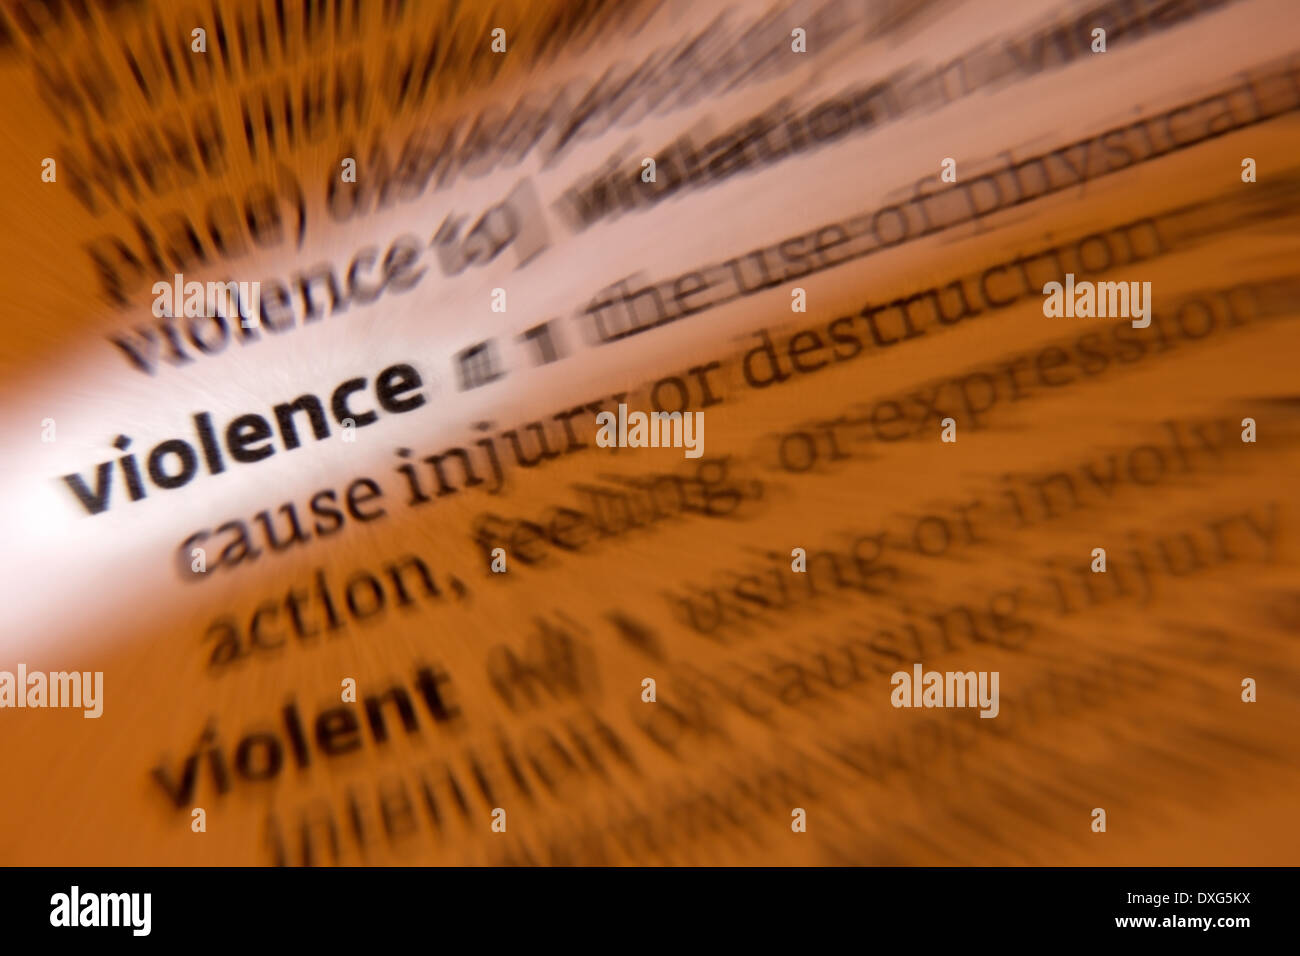 Violence - Stock Image